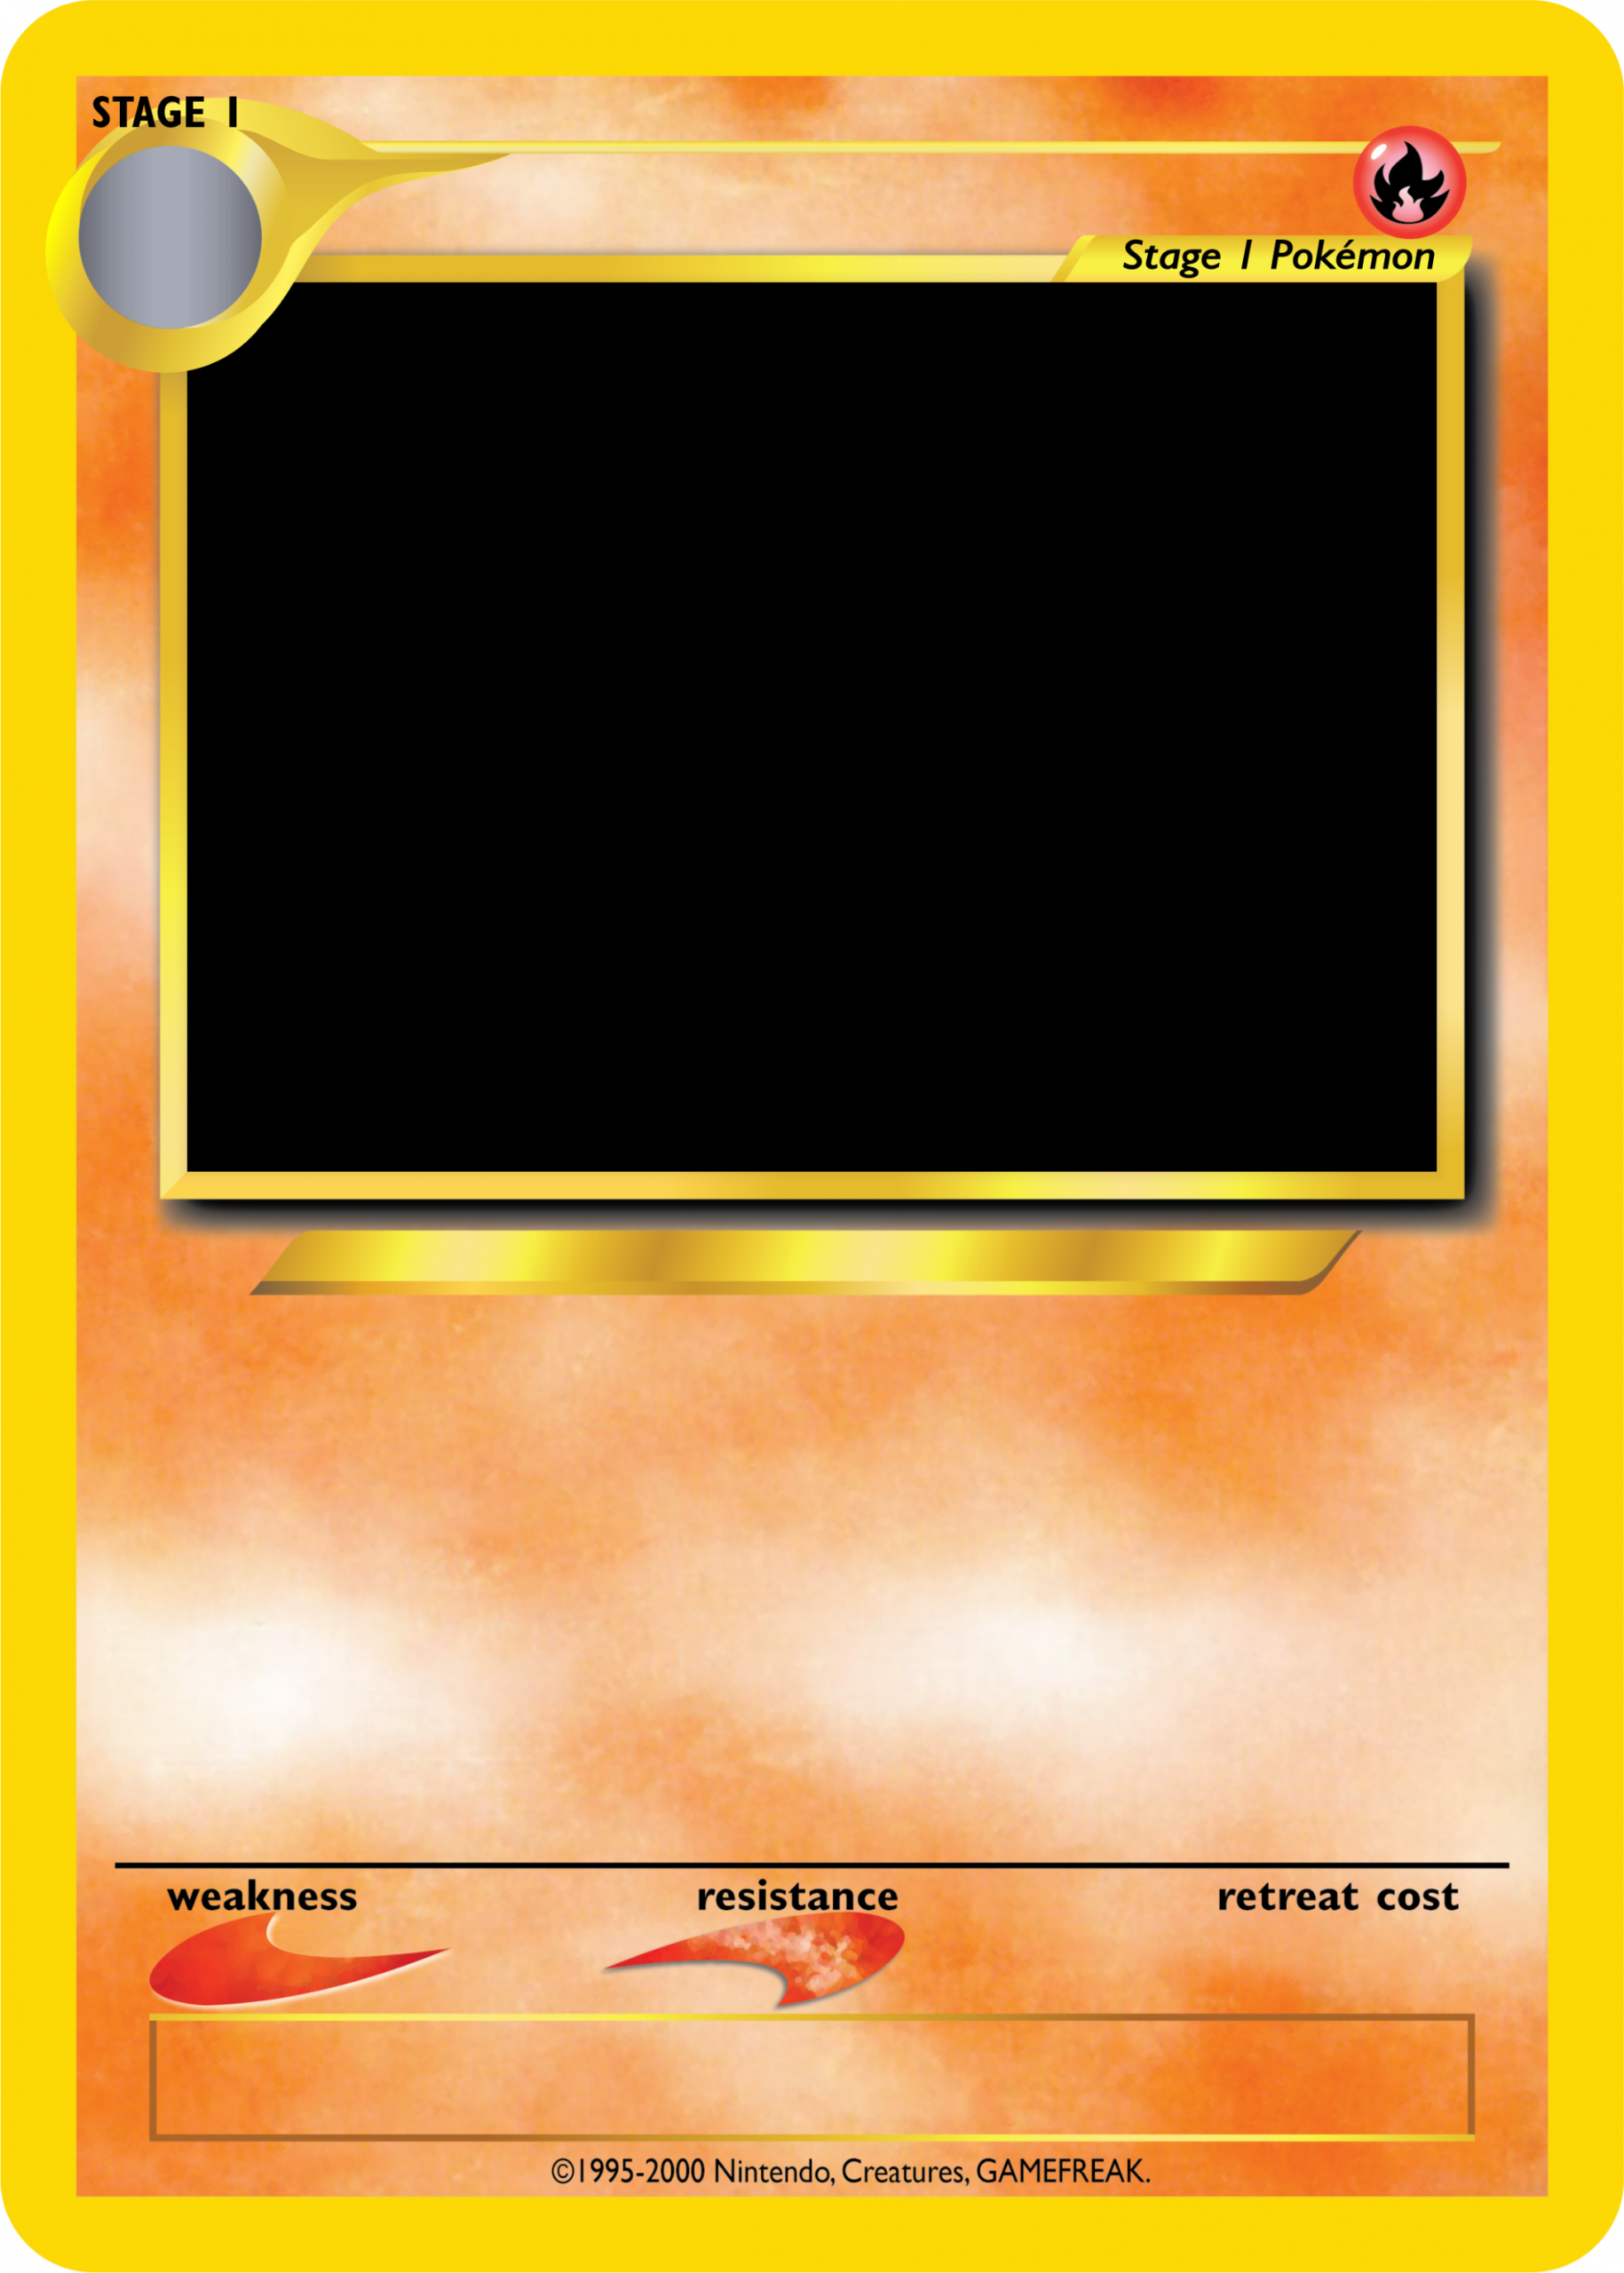 Blank Holo Pokemon Card Pokemon Card Template Magic The Gathering Cards Card Template